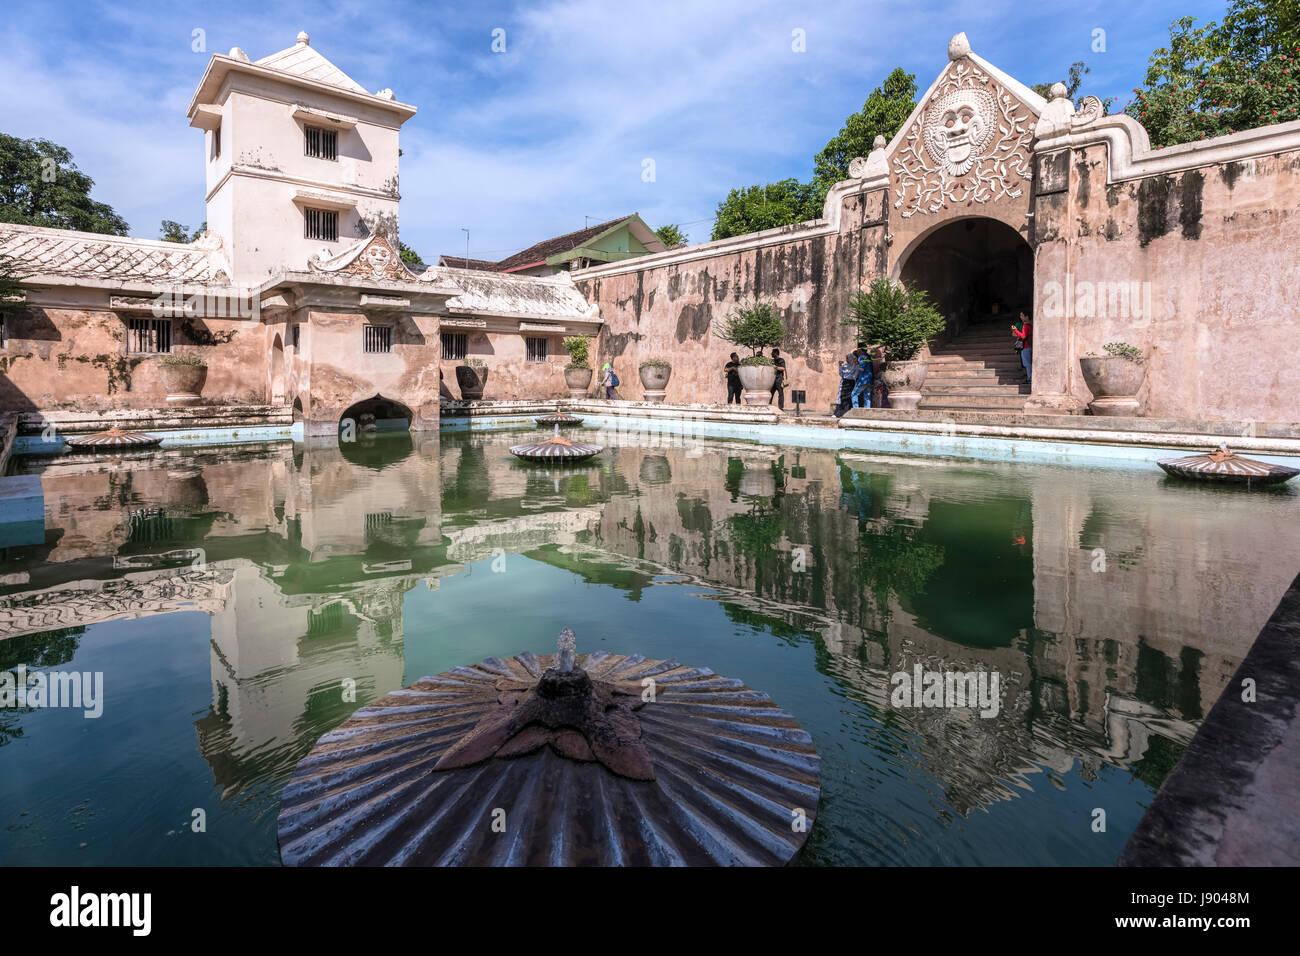 Taman Sari, acqua Palace, Yogyakarta, Java, Indonesia, Asia Immagini Stock